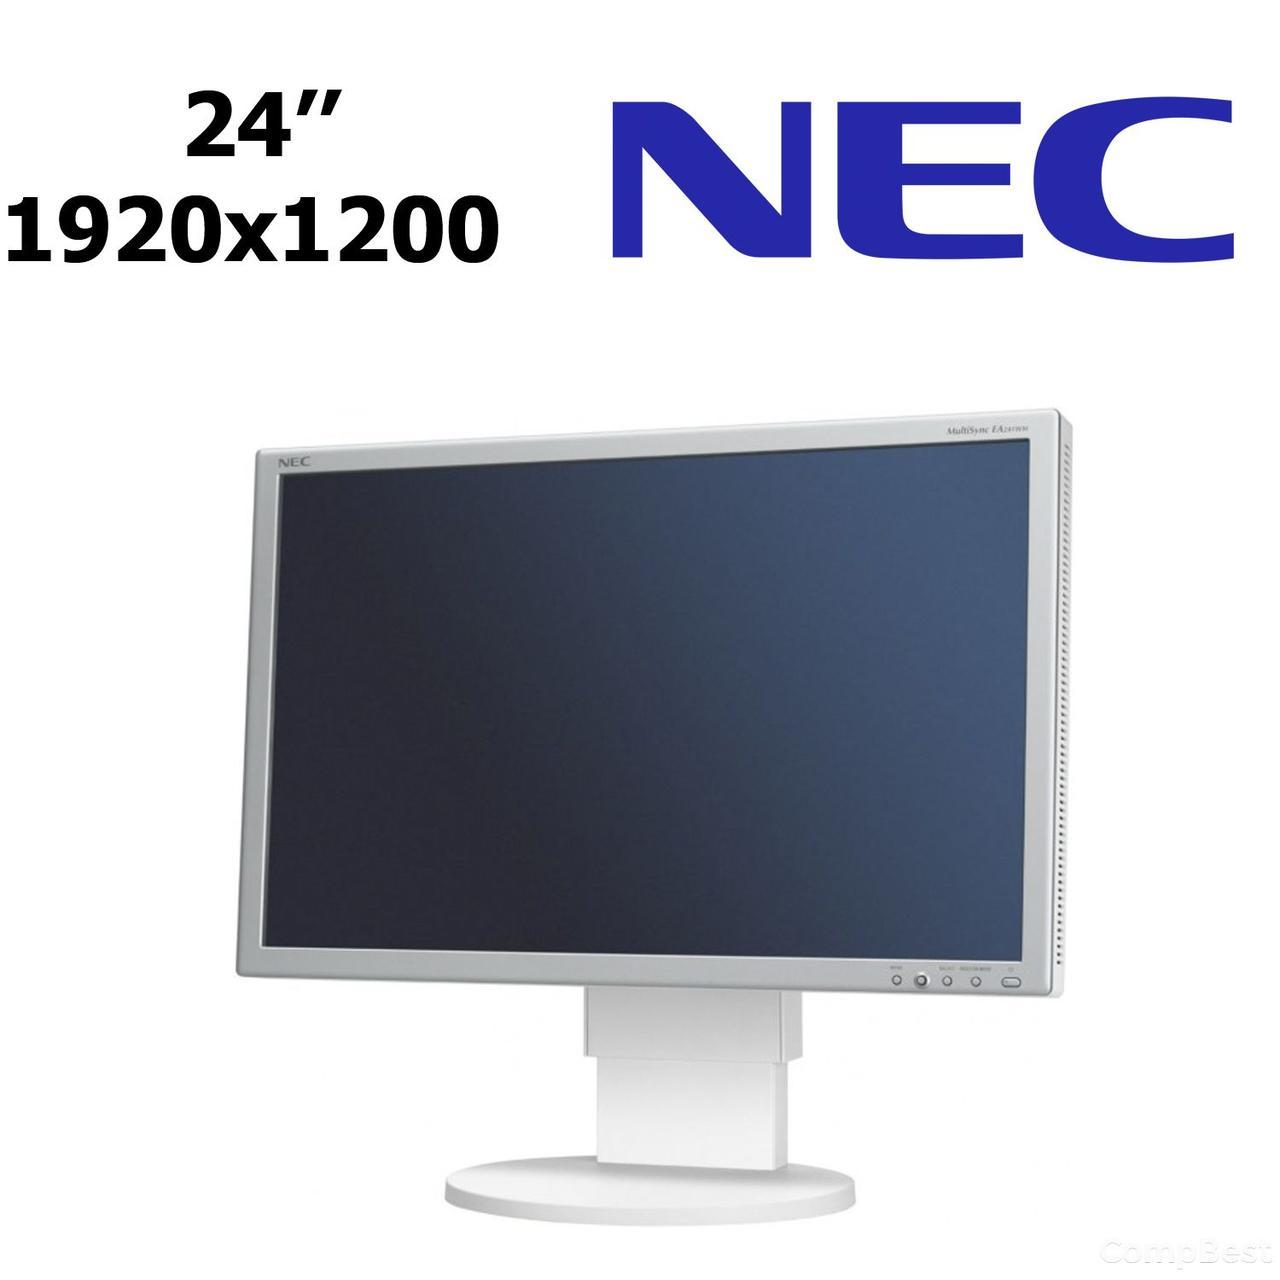 Монитор NEC MultiSync  EA241WM / 24'' / 1920x1200 (16:10) / TN / DVI, VGA / USB